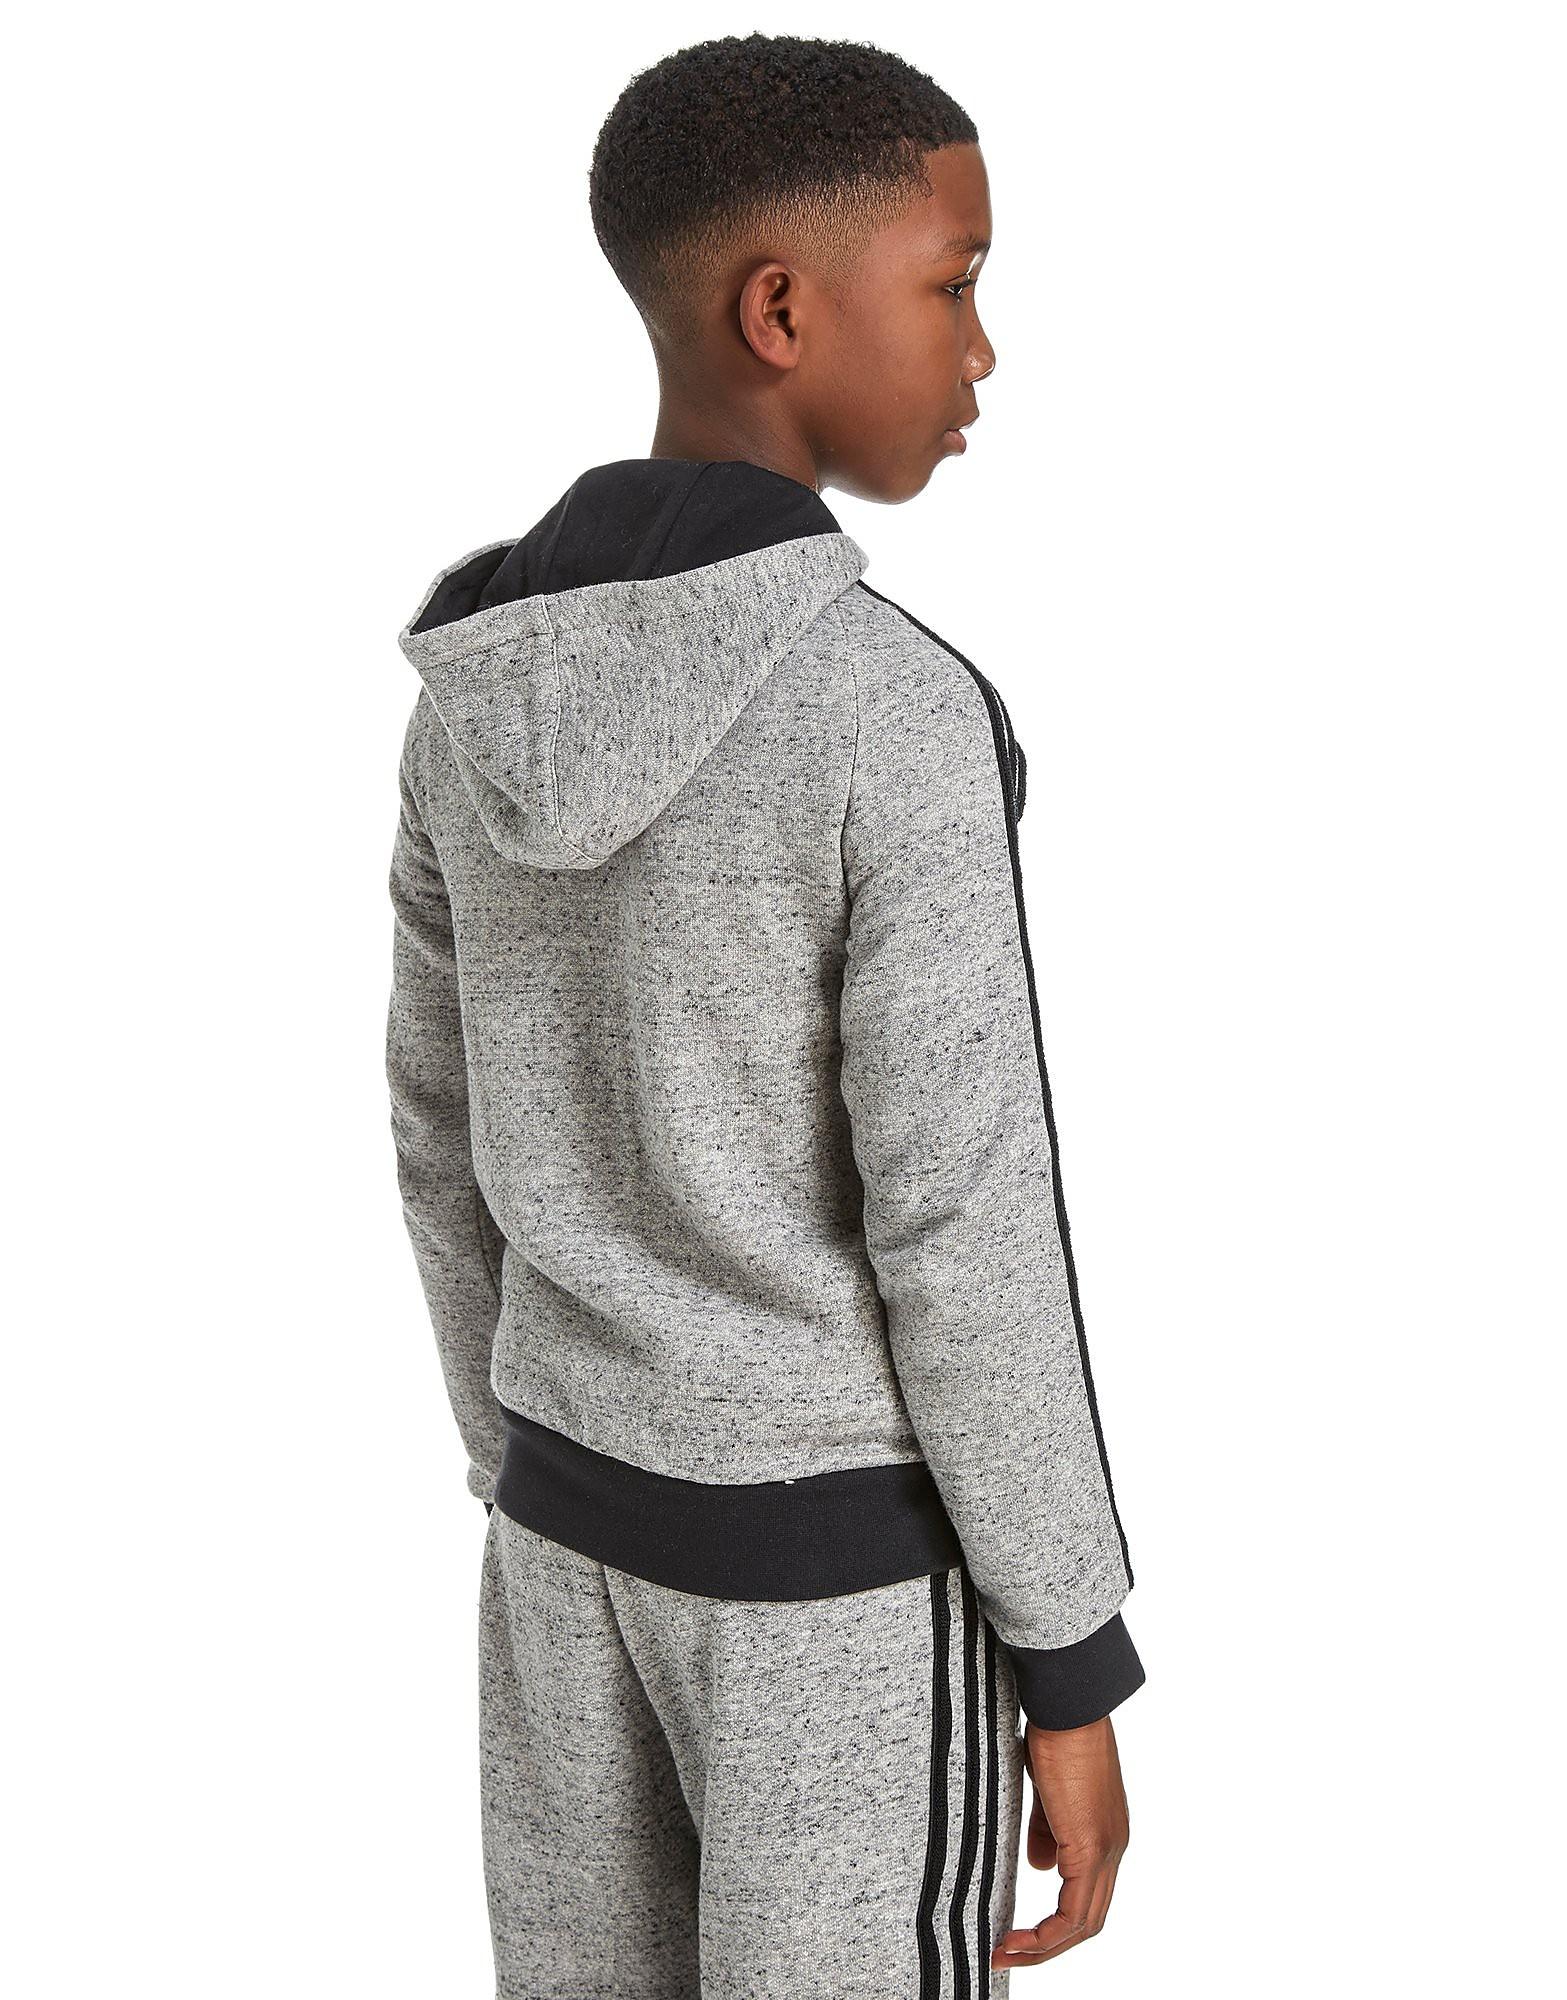 adidas Originals Trefoil Series Track Jacket Junior